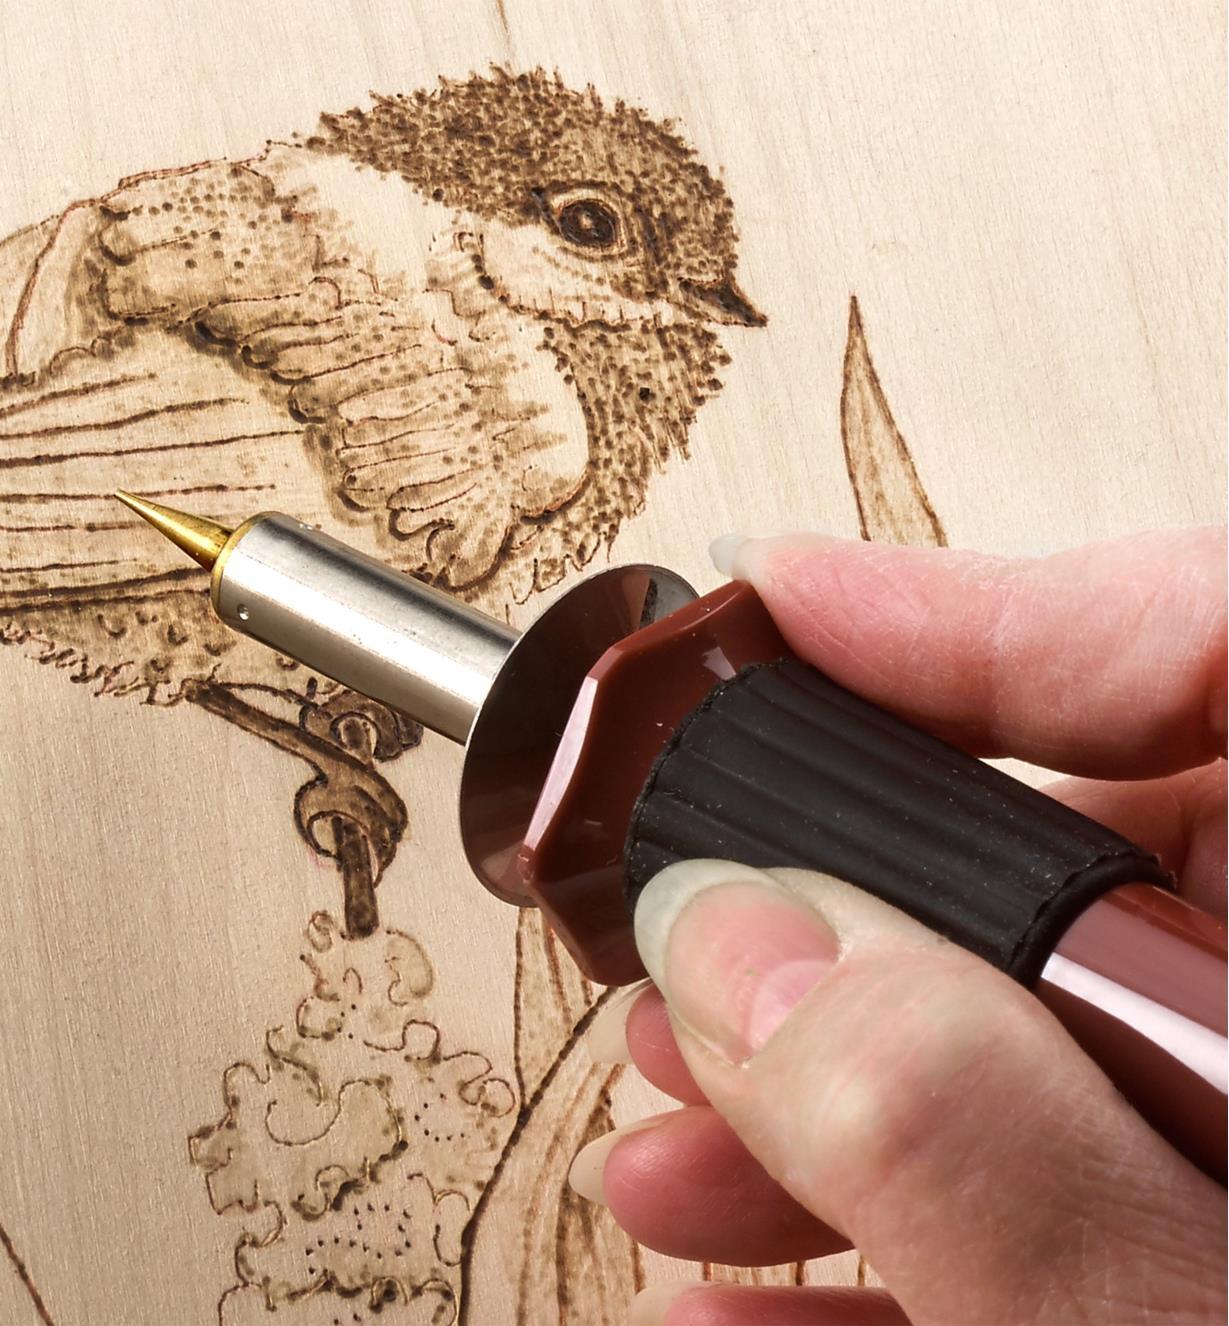 Burning a bird design into wood using the Multi-Function Heat Pen Set